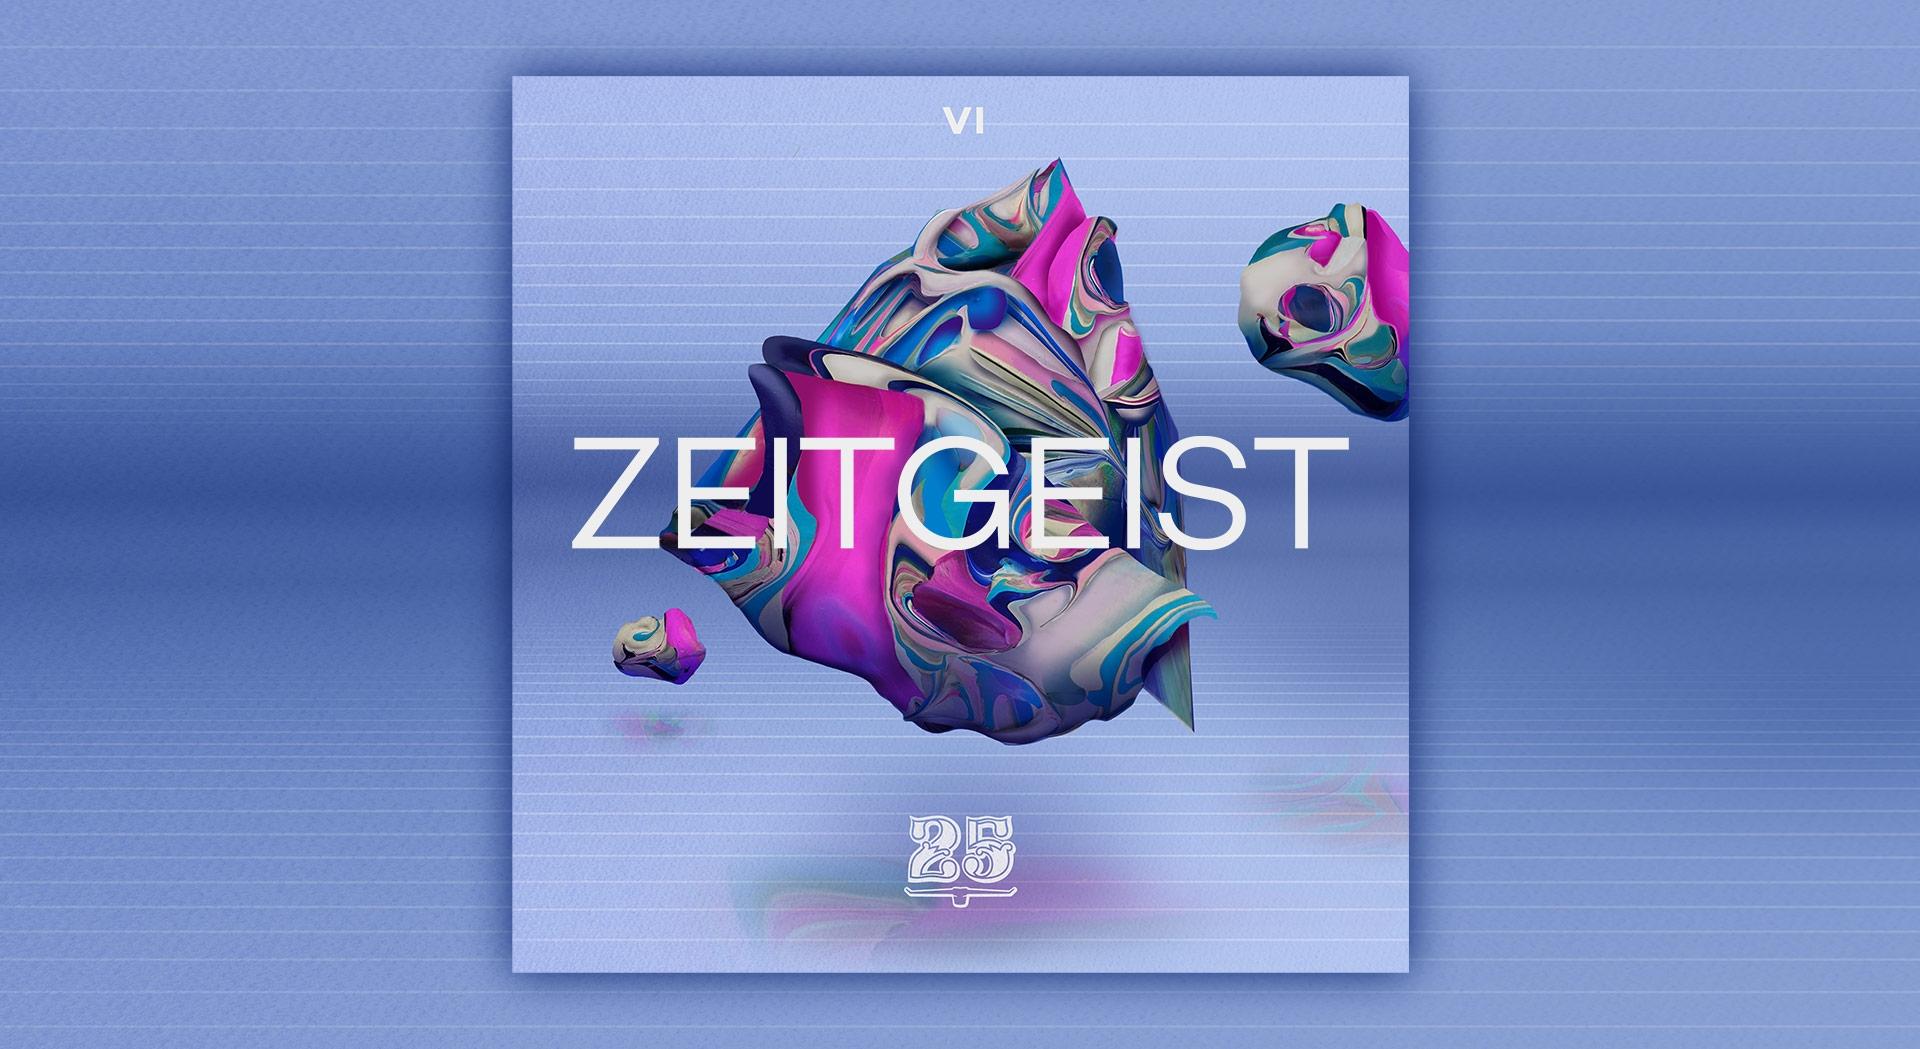 Svenja Limke <strong>BAR 25 MUSIC</strong></br>Cover Artwork ZEITGEIST VI